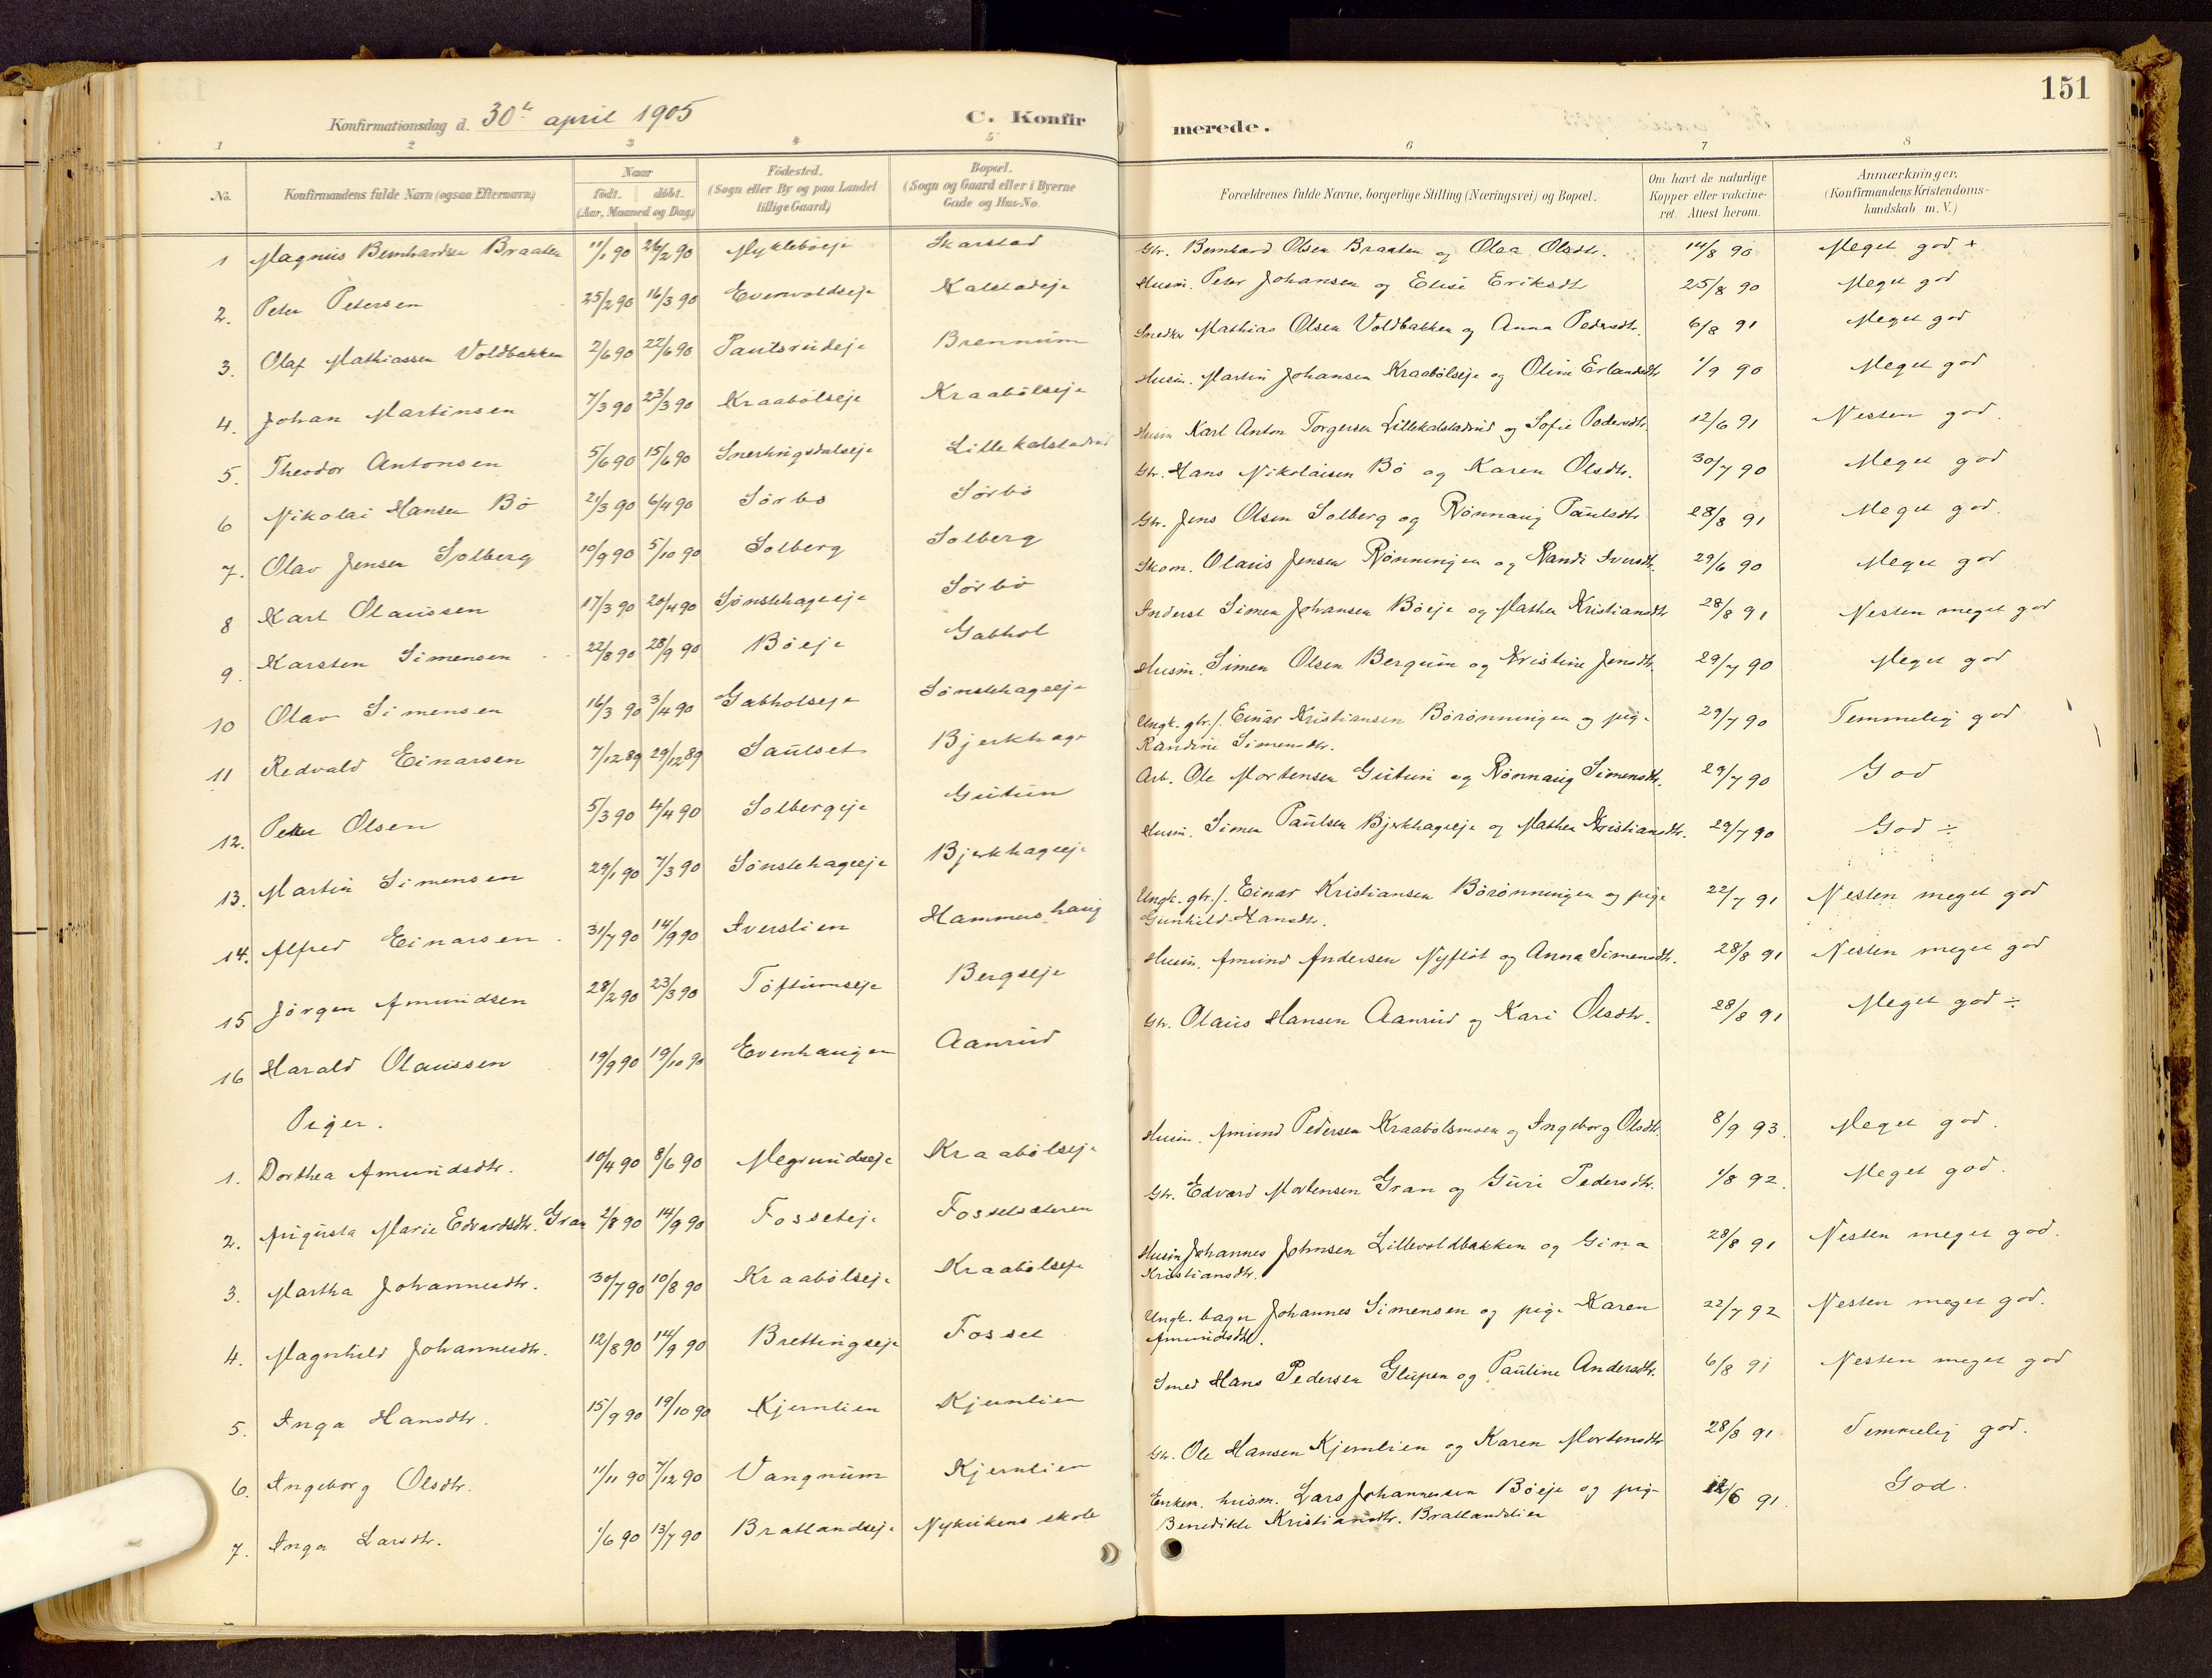 SAH, Vestre Gausdal prestekontor, Ministerialbok nr. 1, 1887-1914, s. 151